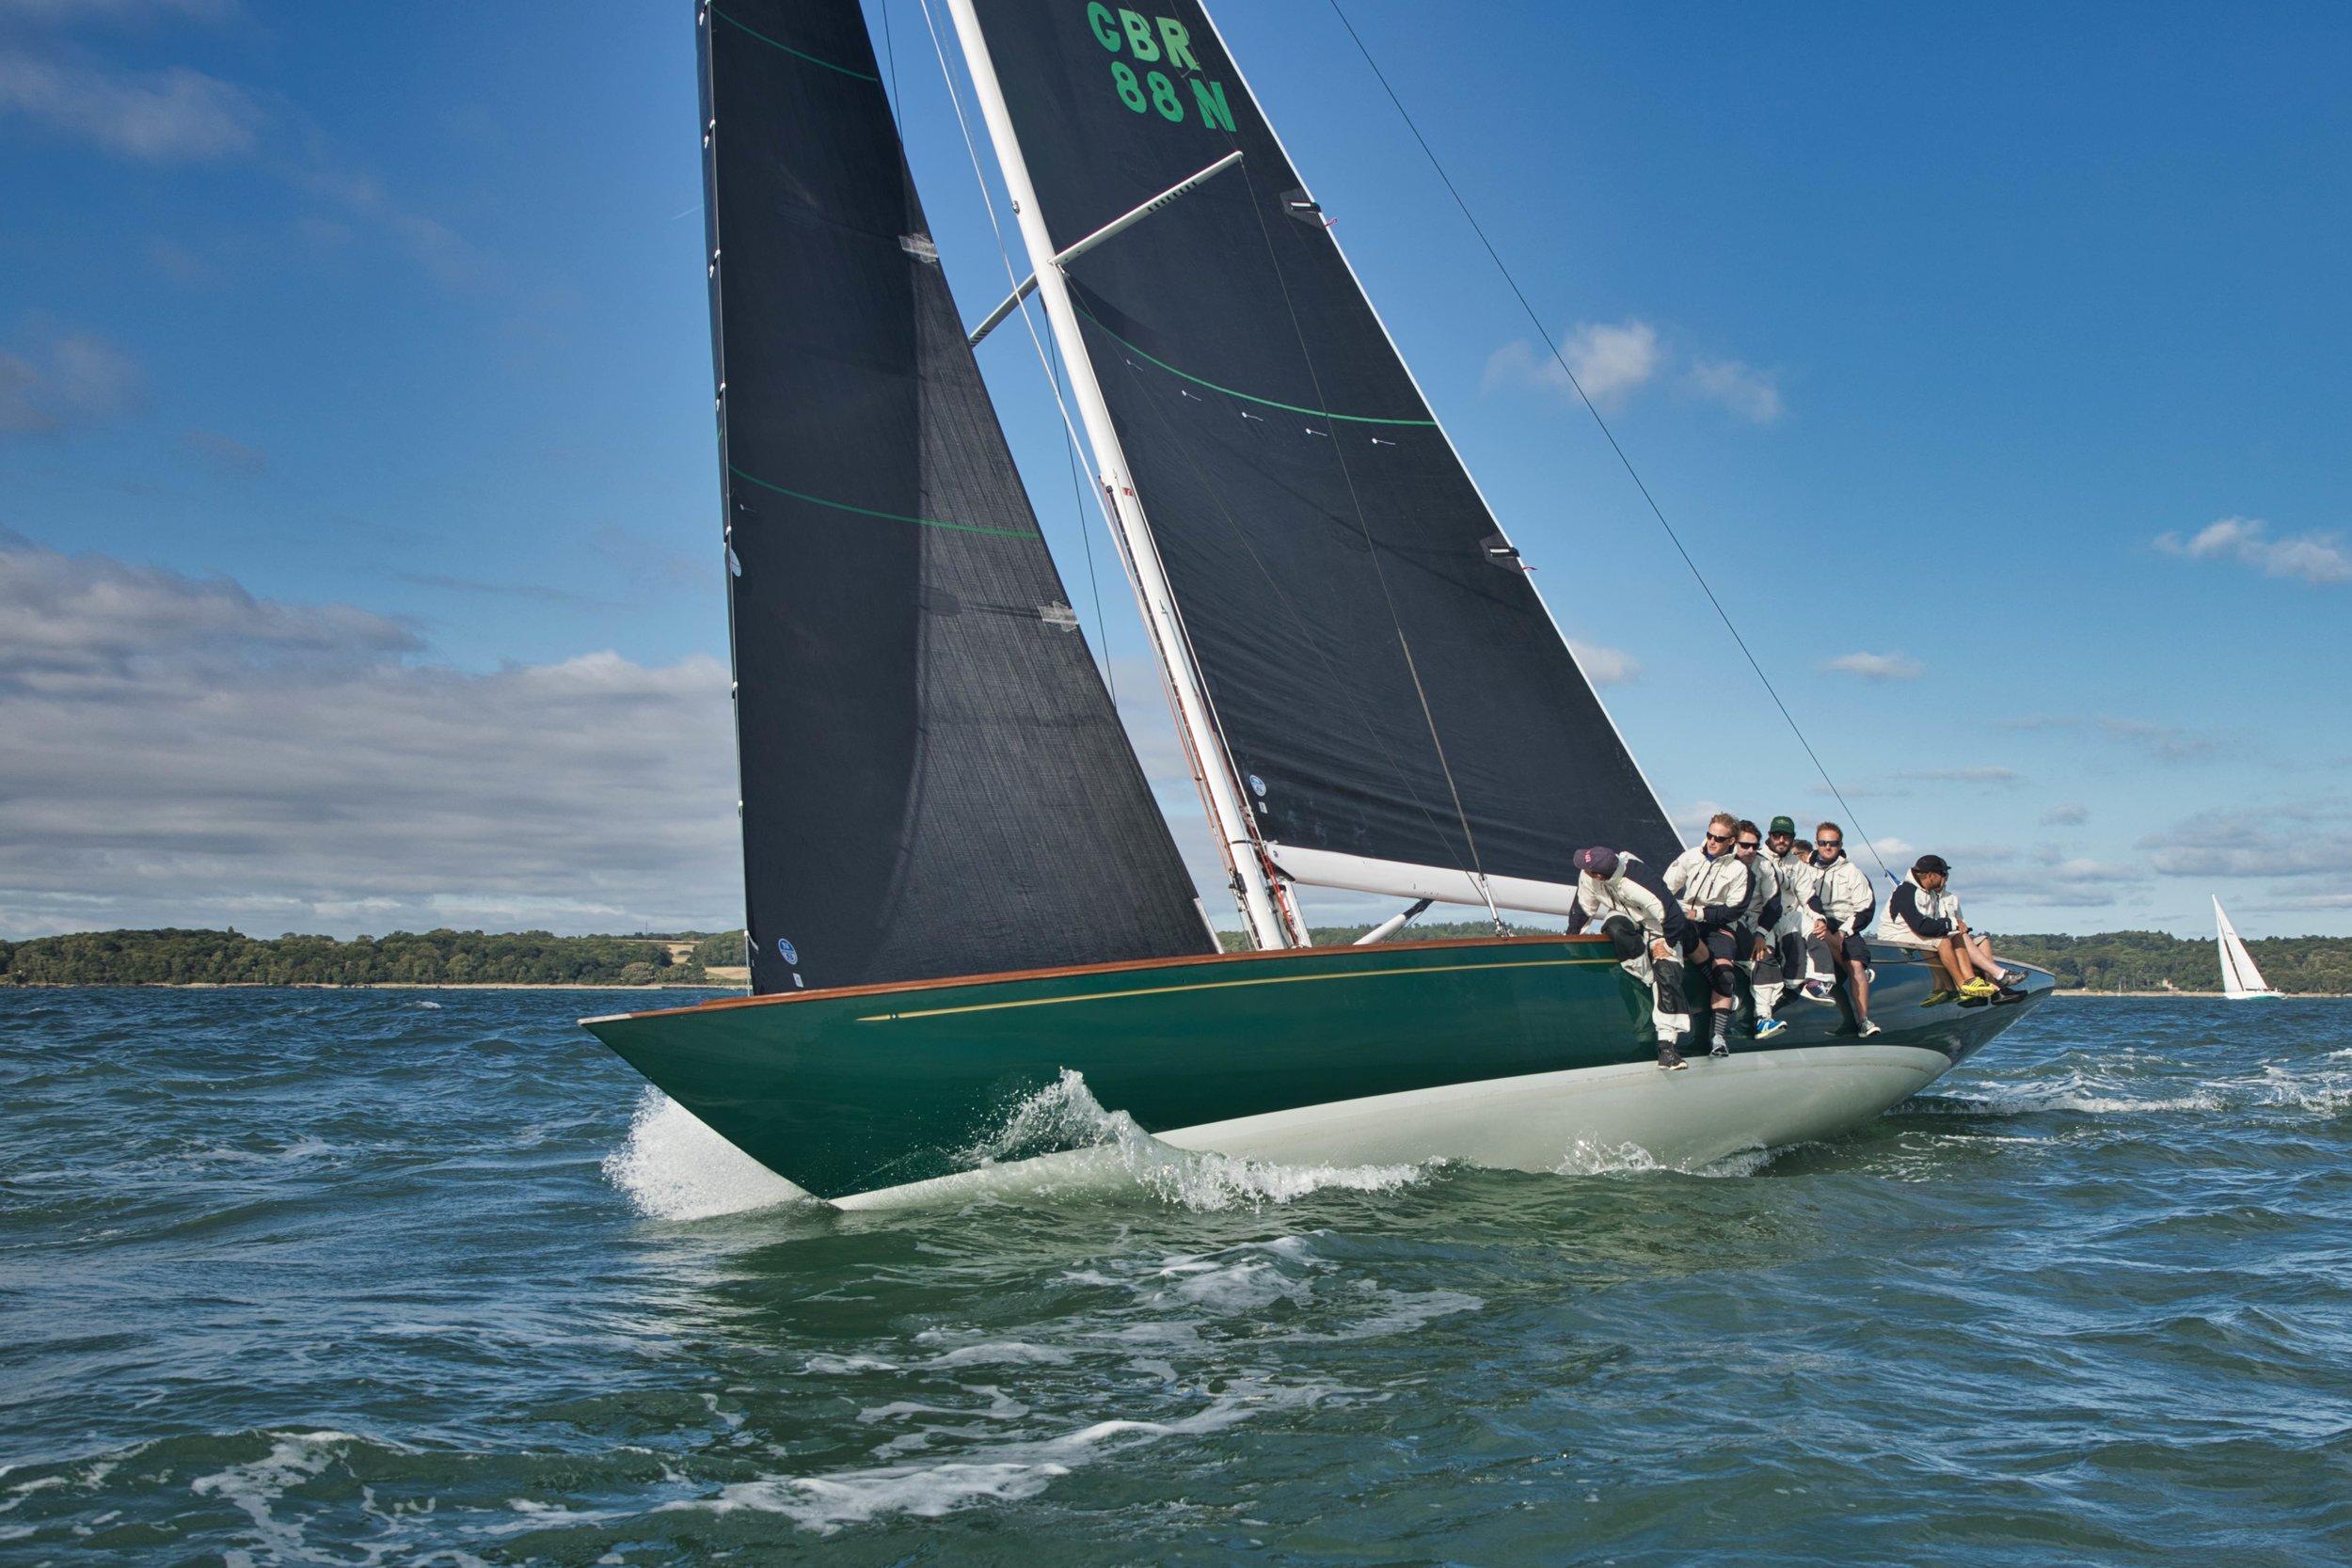 Class 1 (modern classic, Spirit of Tradition yachts) winner, Spirit 52 Oui Fling